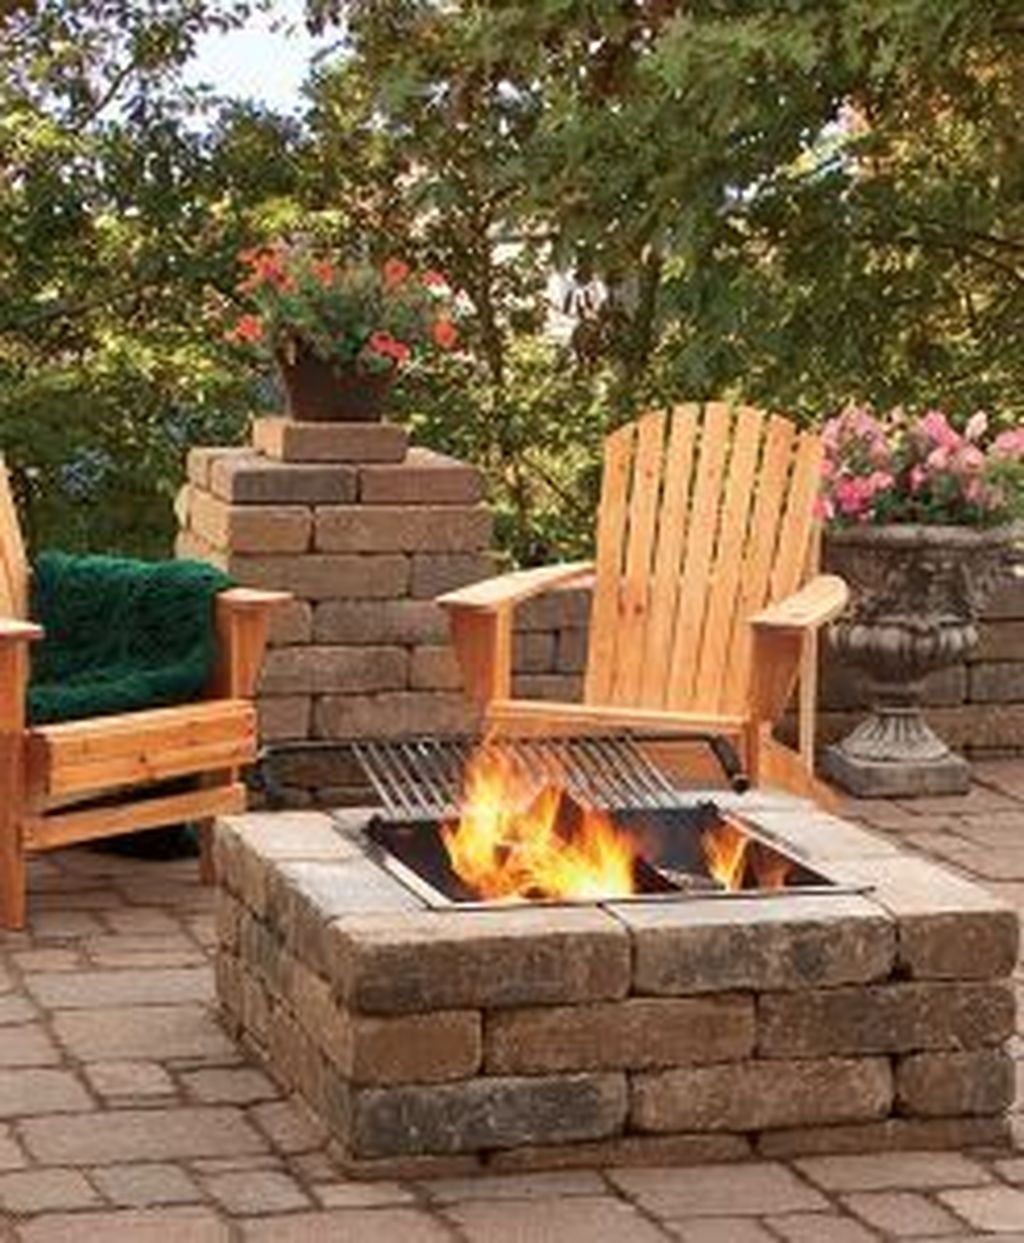 Fabulous Stone Fire Pit Design And Decor Ideas 09